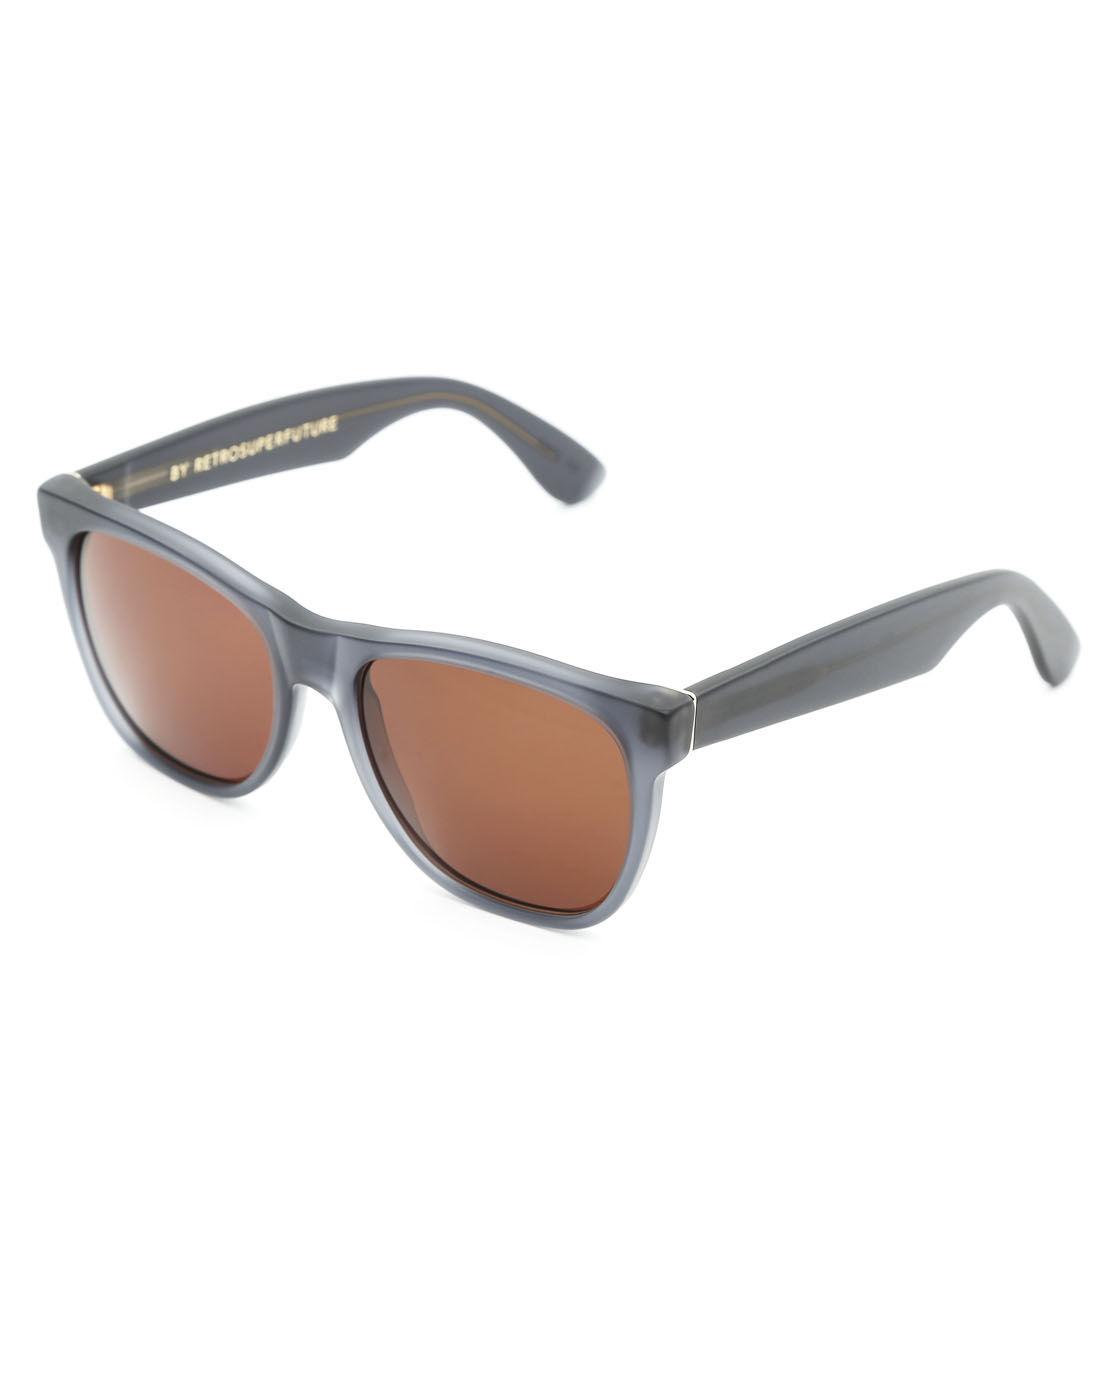 5dc0f9083c Super Dark Sunglasses Ray Ban « Heritage Malta